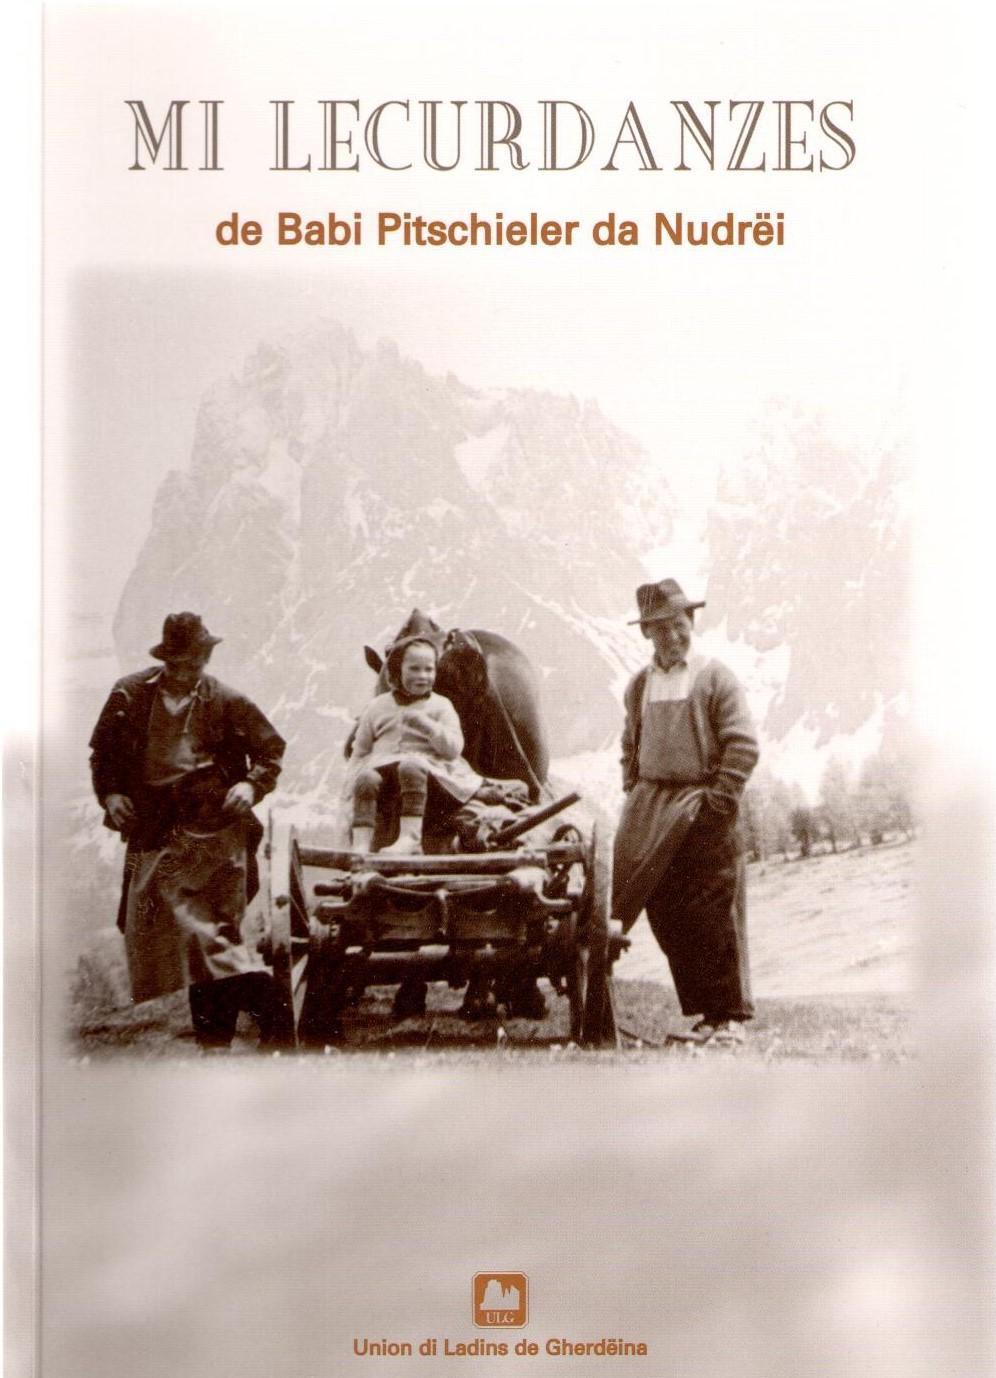 Mi_lecurdanzes,_Babi_Pitschieler_da_Nudrëi,_ULG